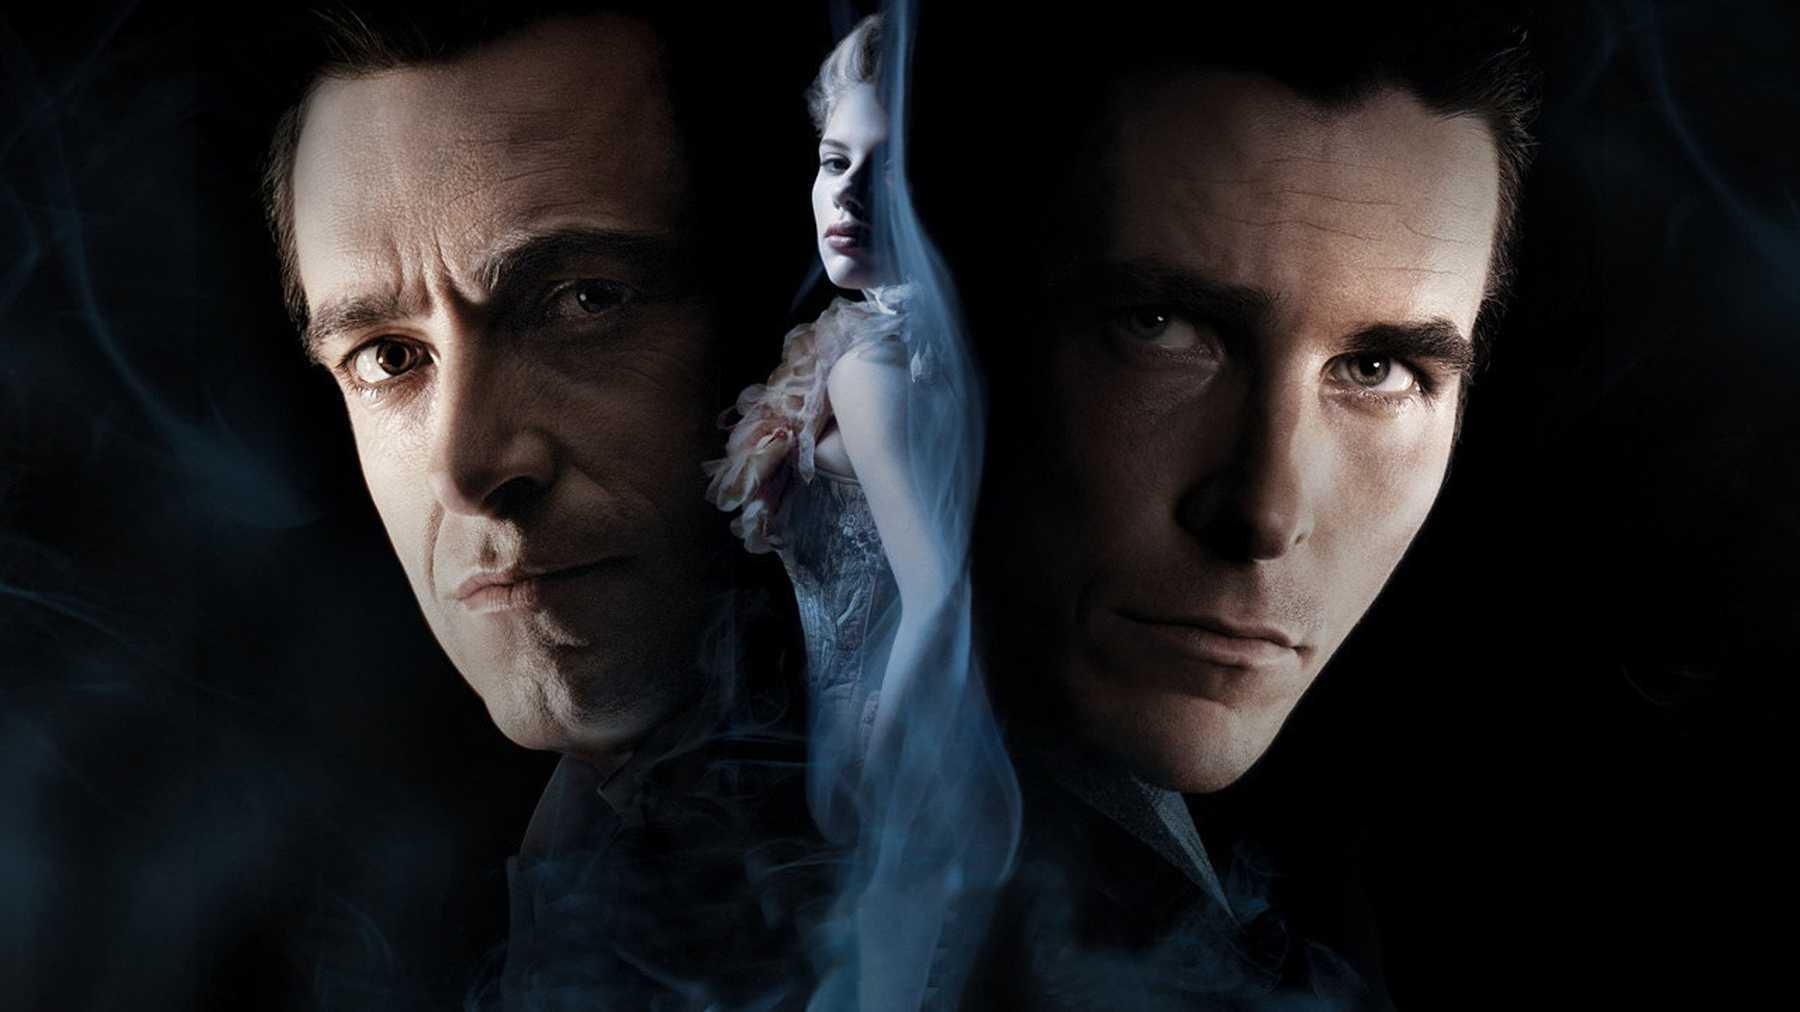 The Prestige - Dual Protagonists